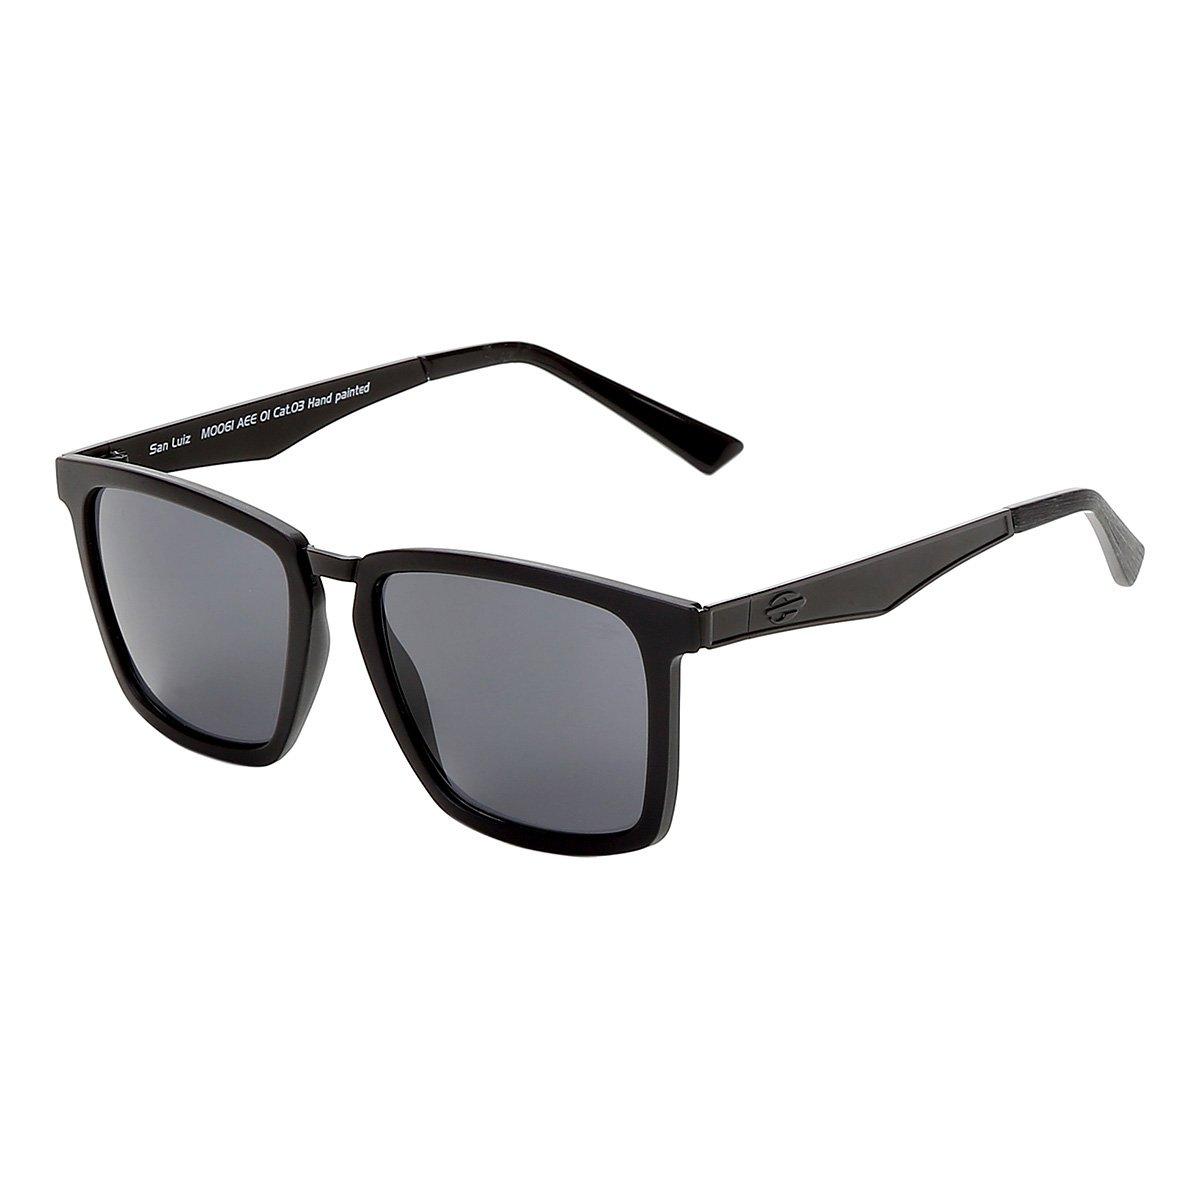 Óculos de Sol Mormaii San Luiz Masculino - Compre Agora   Zattini df8271ee01